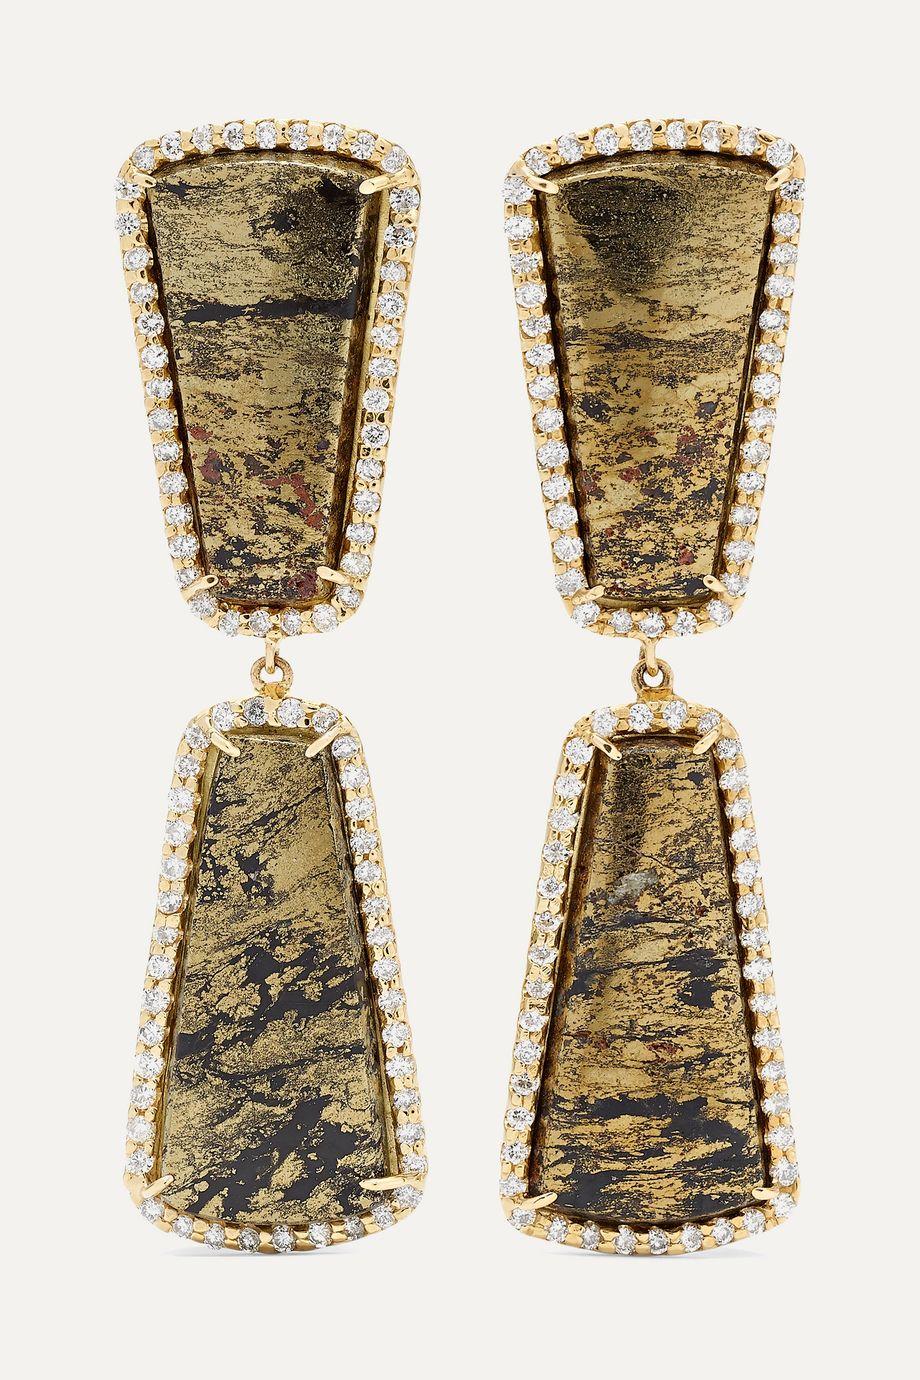 Kimberly McDonald + NET SUSTAIN 18-karat gold, apache gold and diamond earrings